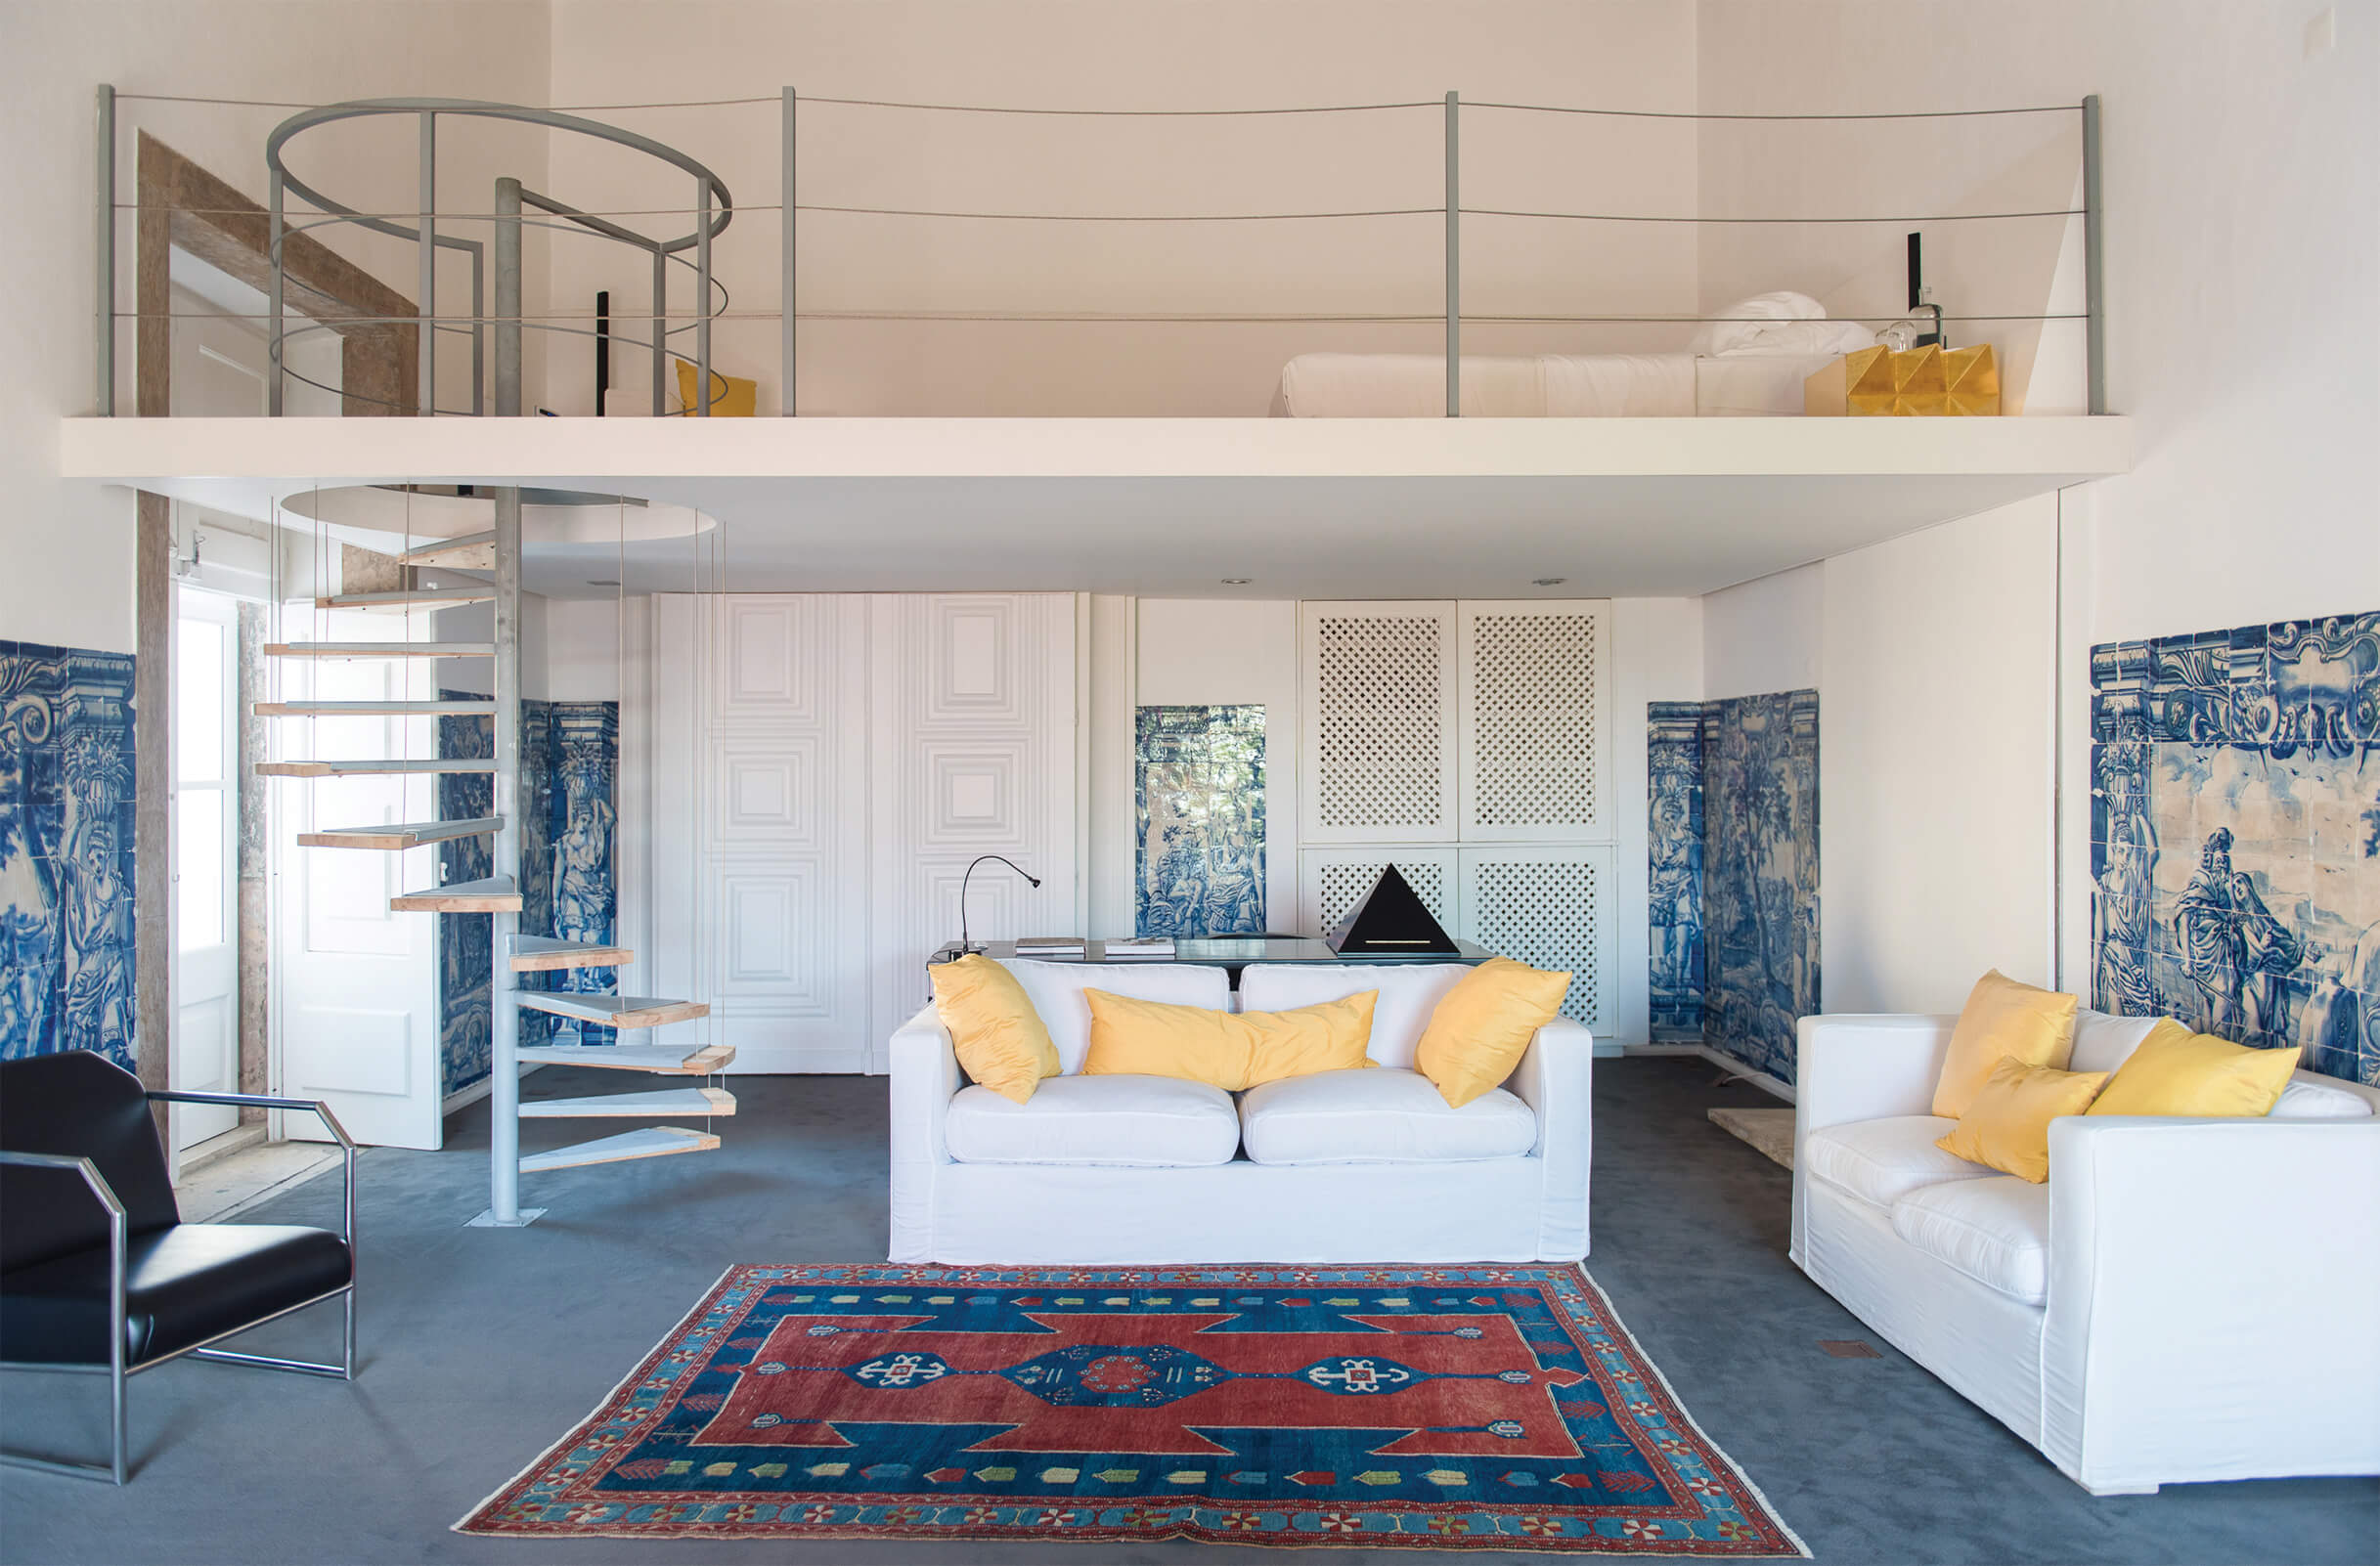 The Amadeo de Souza Cardoso suite living room and mezzanine 02 ┬® Sivan Askayo.jpg